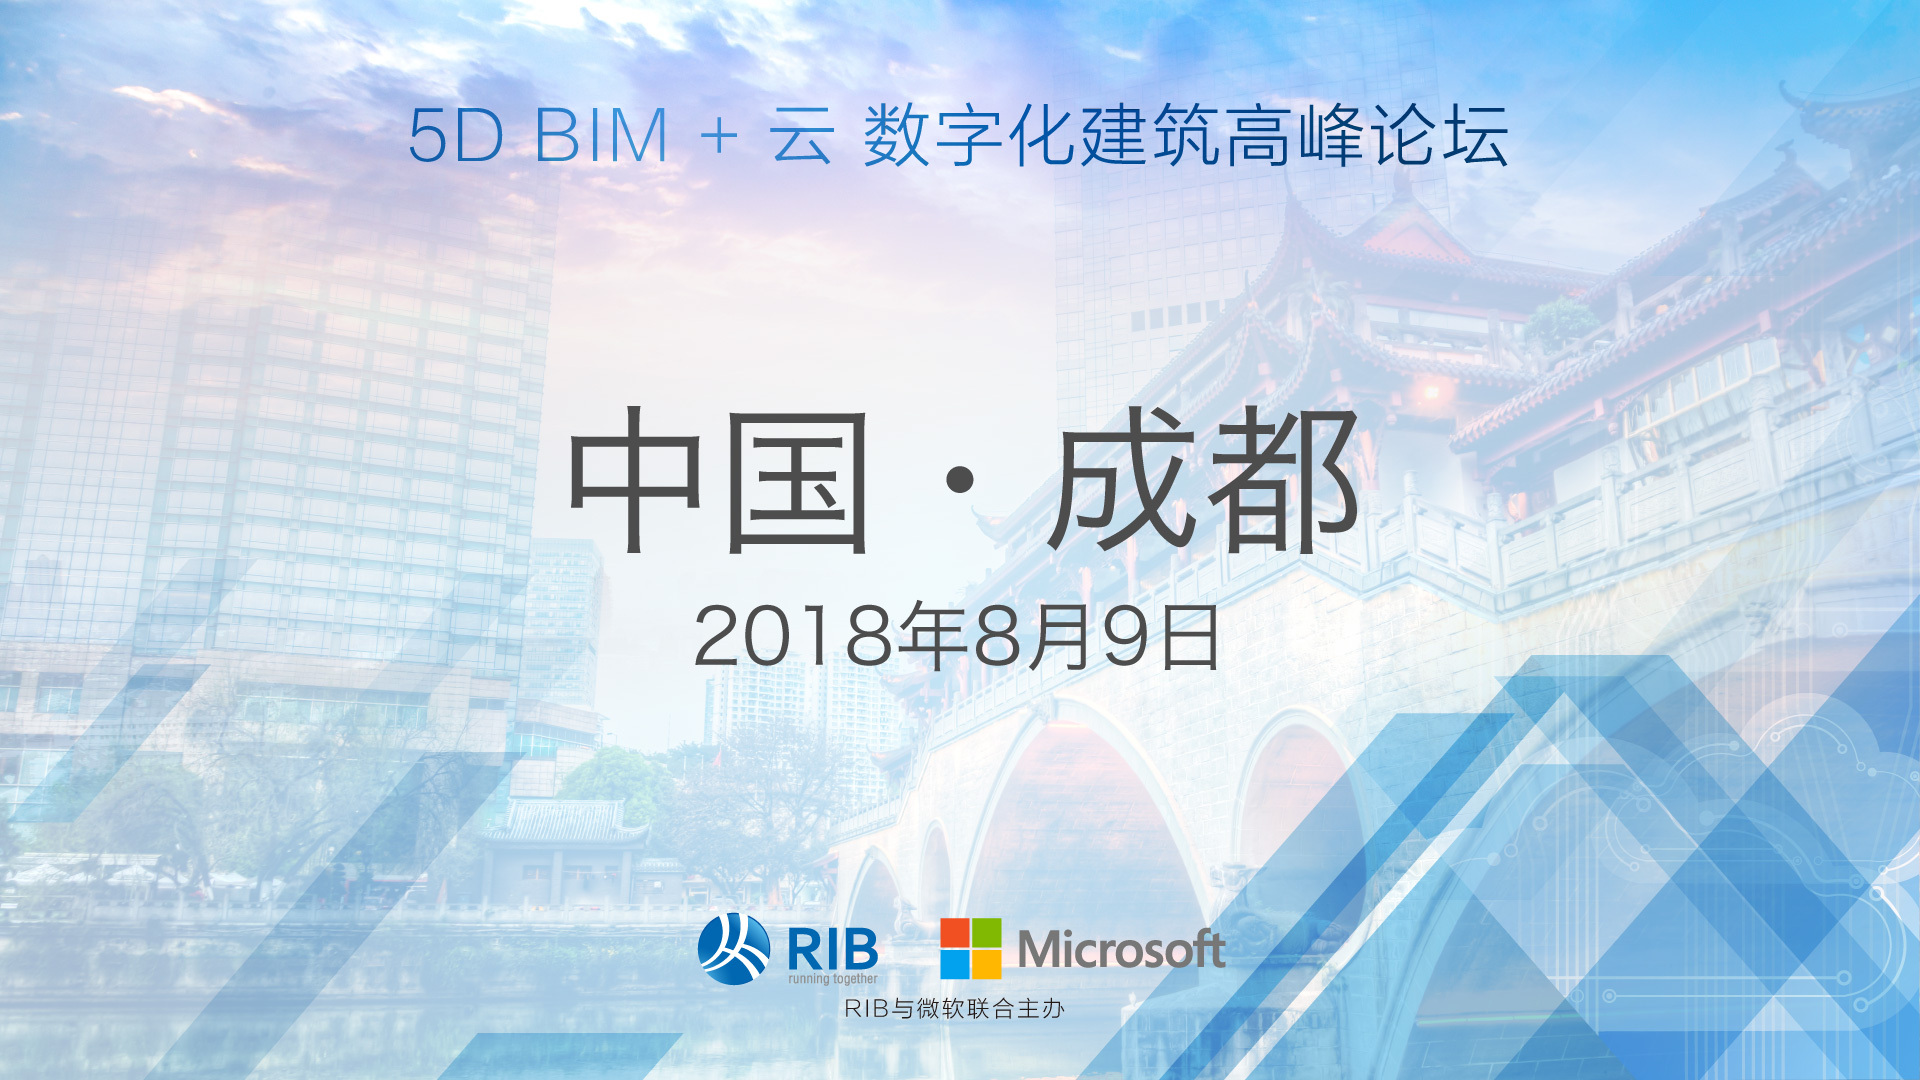 5D BIM+云建筑数字化高峰论坛2018【成都站】